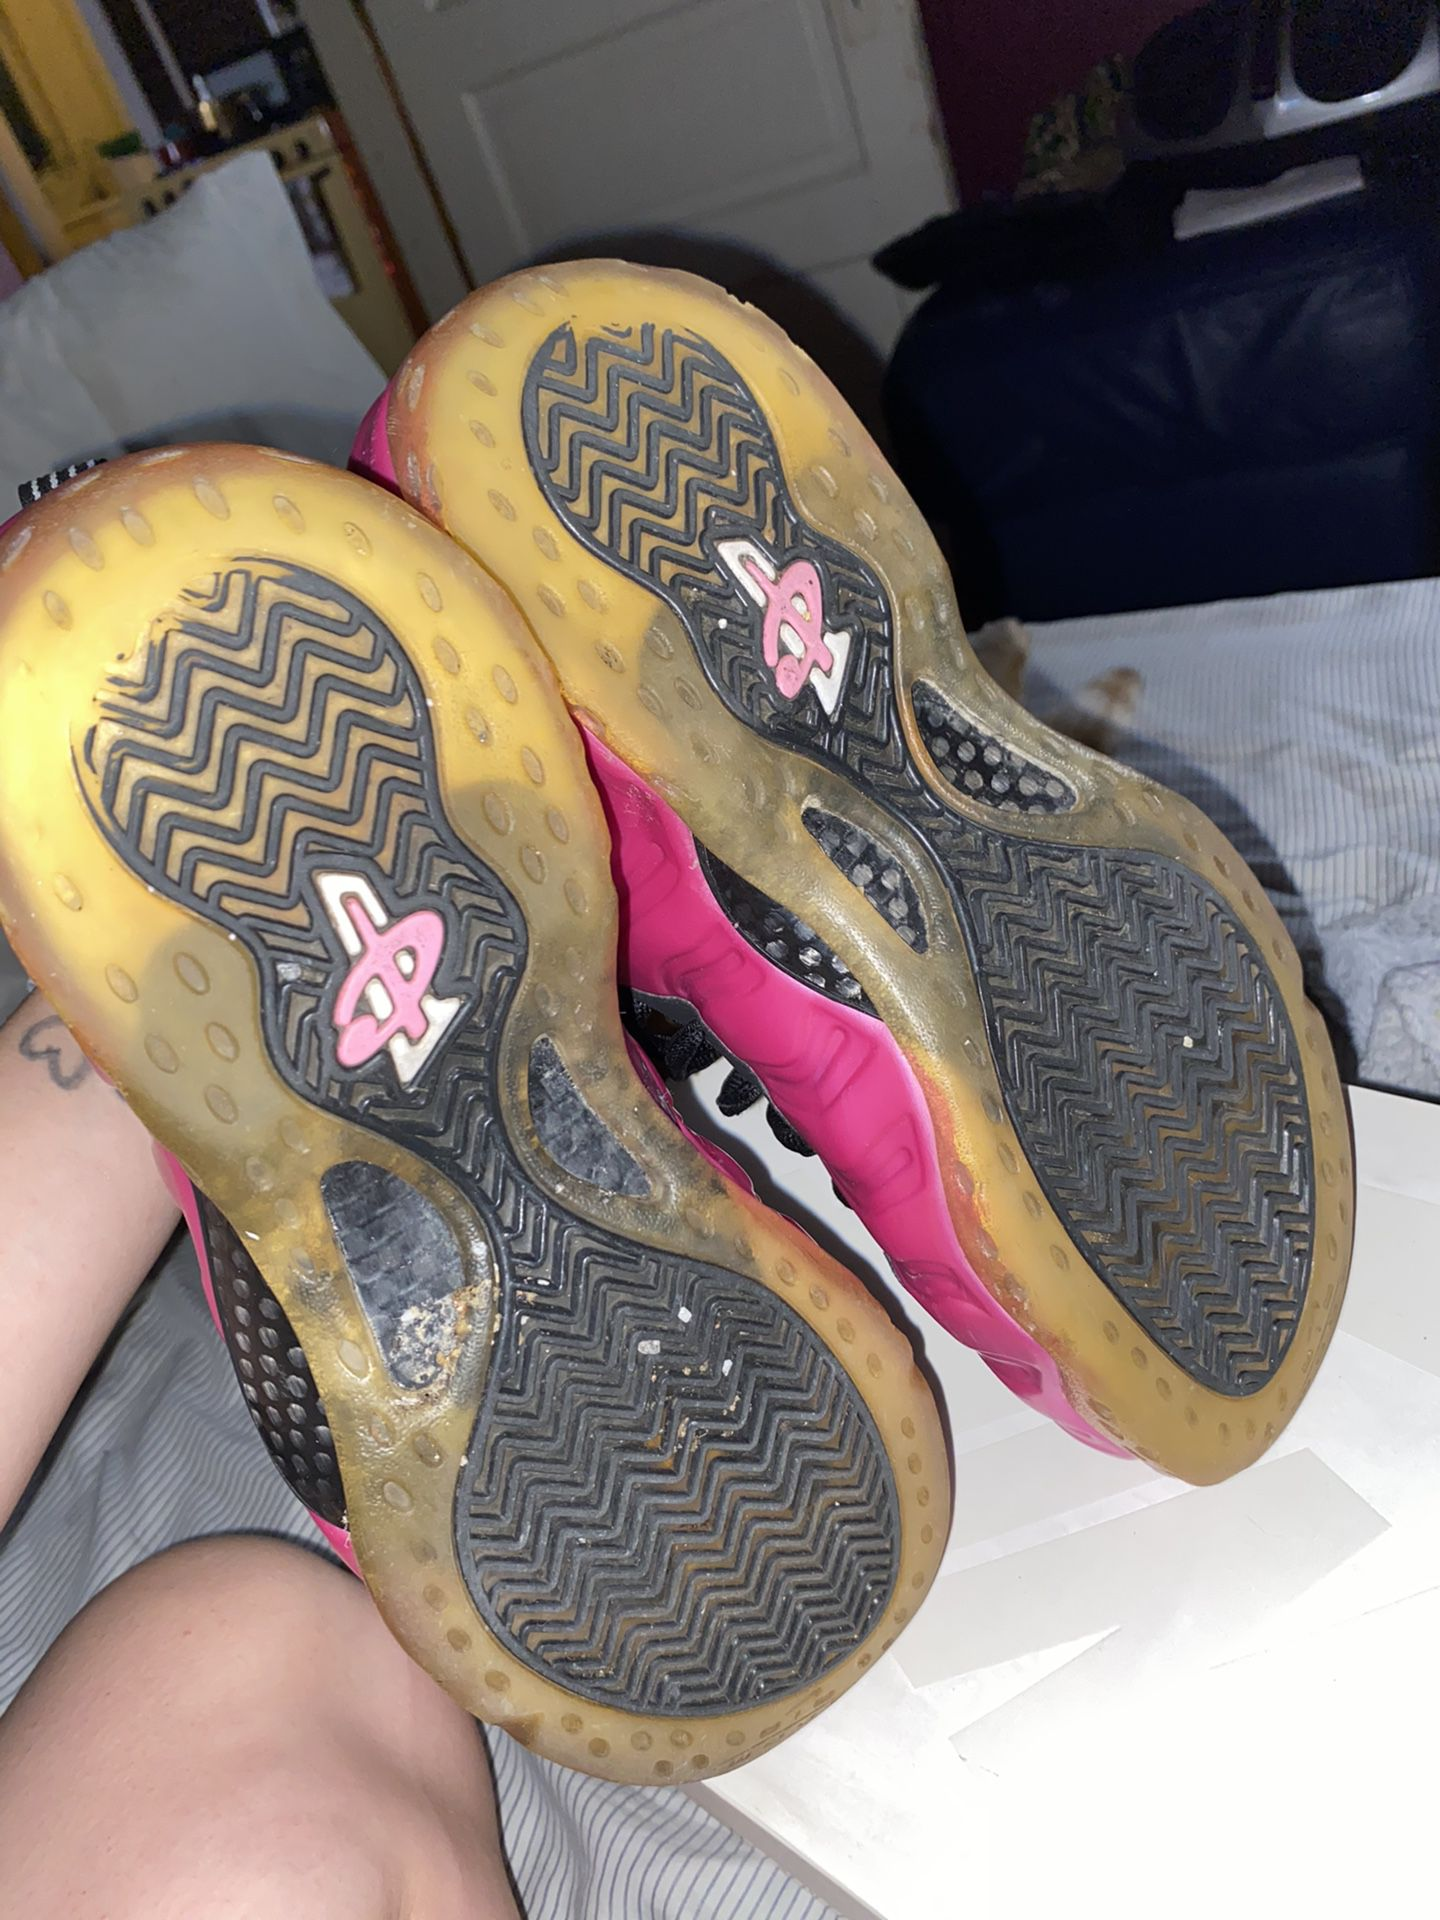 Pearlized Pink Foams